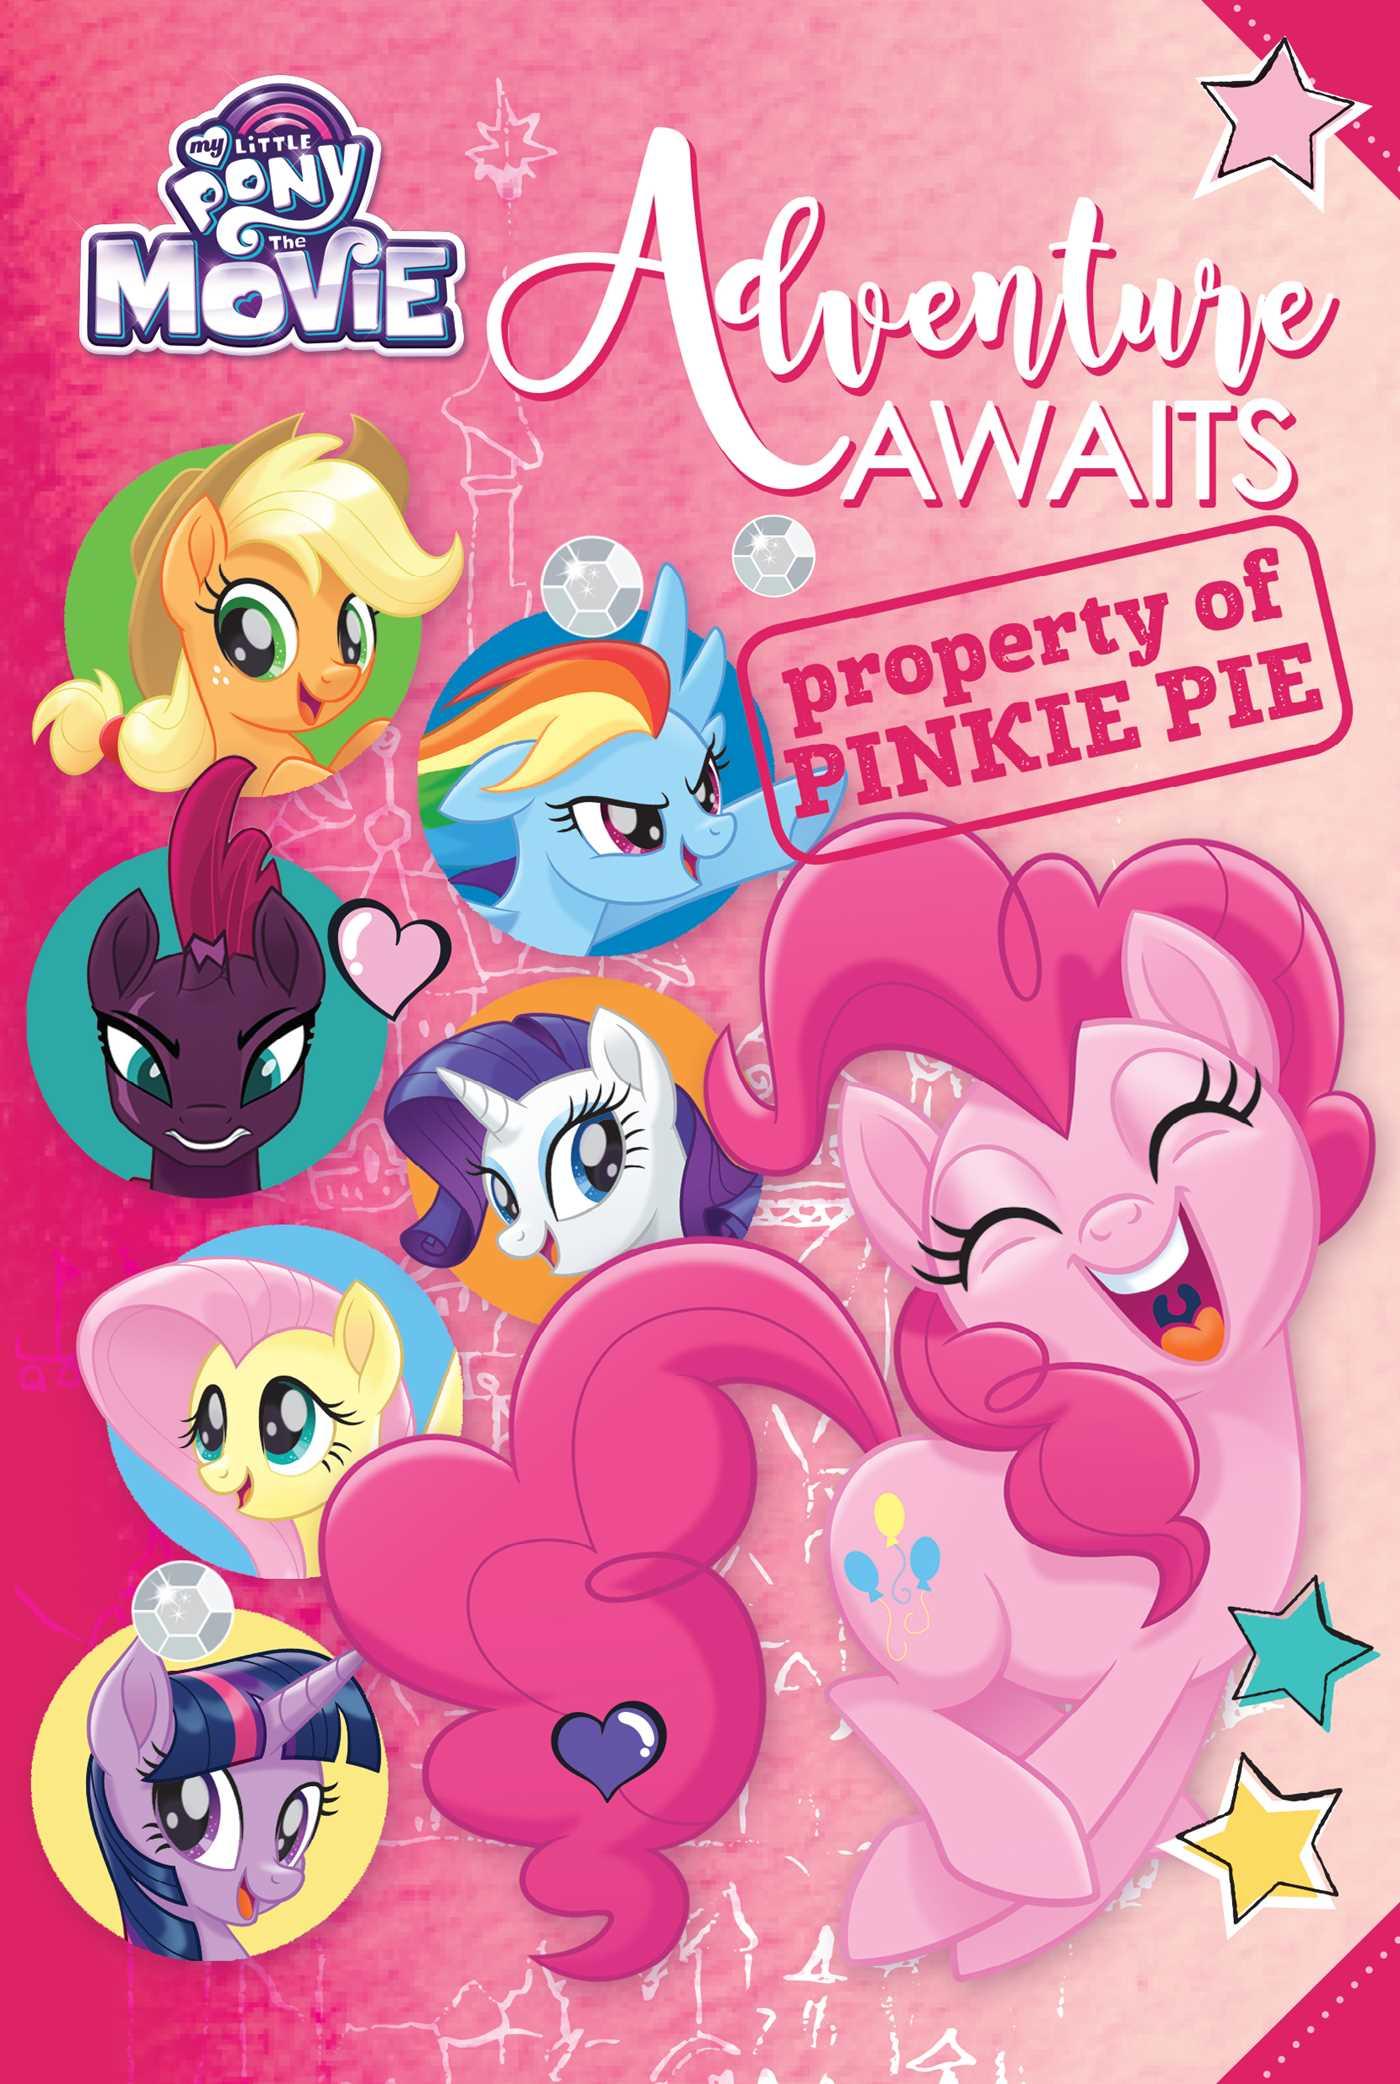 My little pony the movie adventure awaits 9780794440435 hr